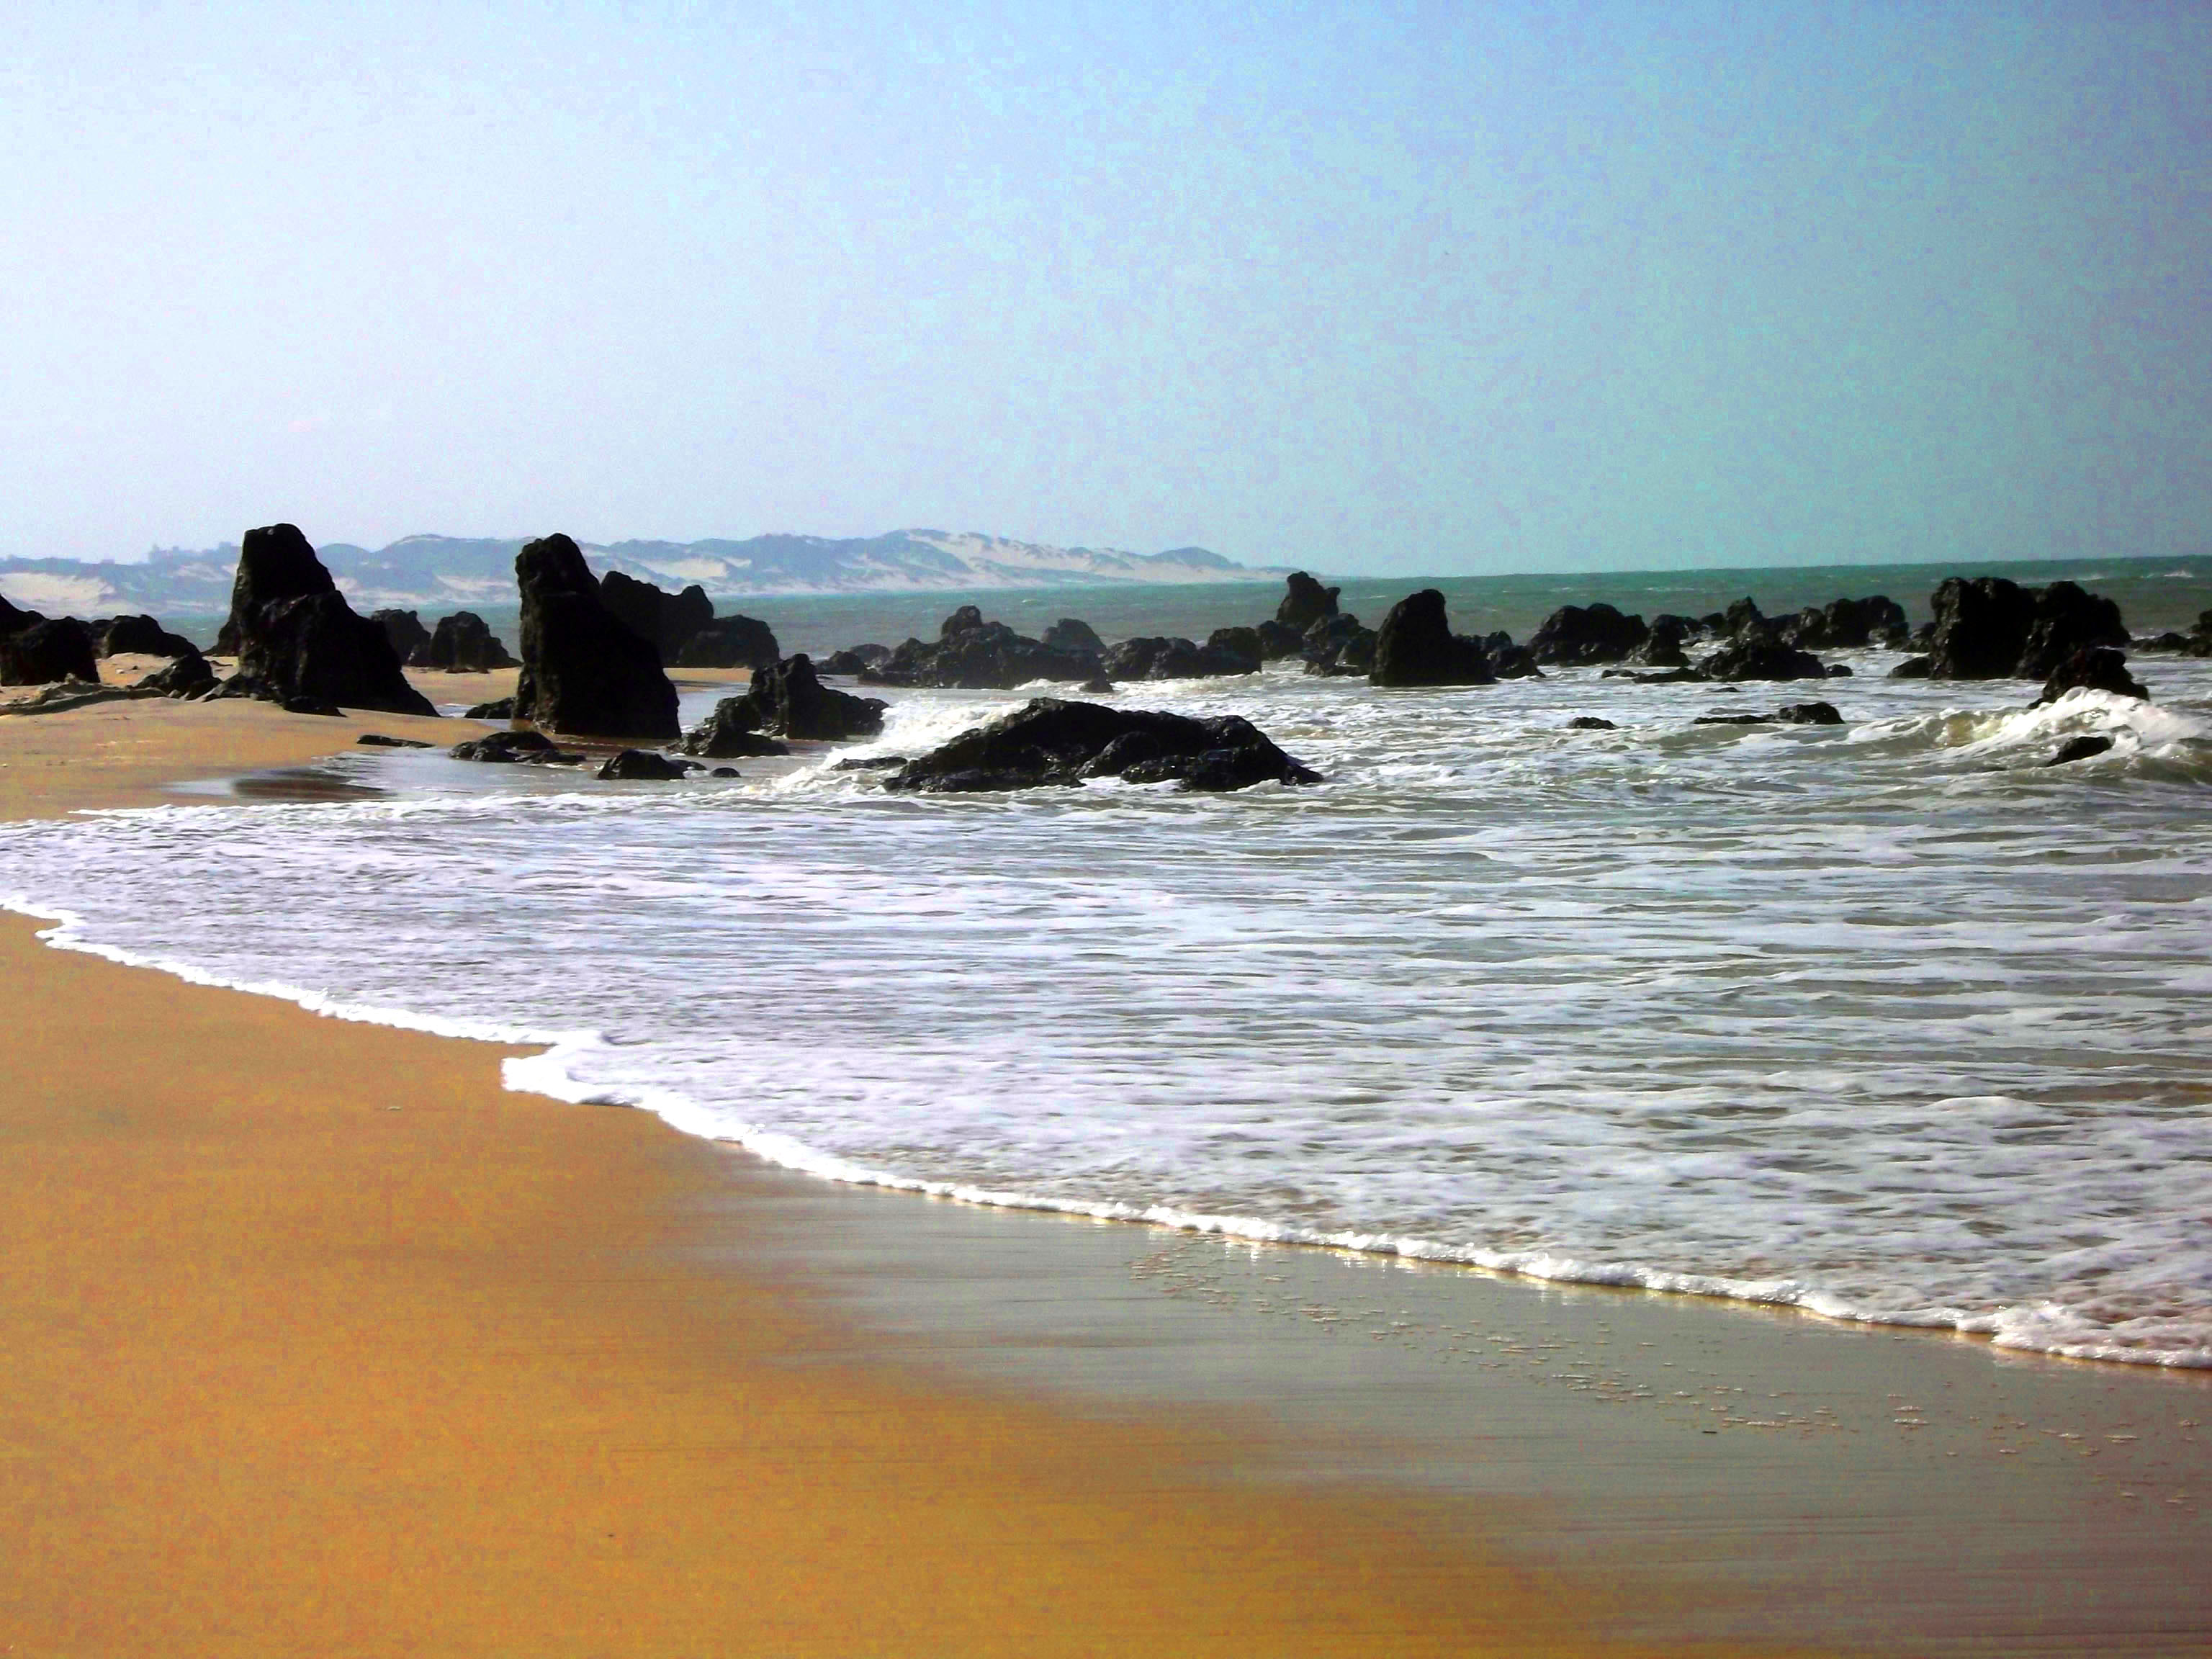 Praia de Maracajaú, Natal, Rio Grande do Norte